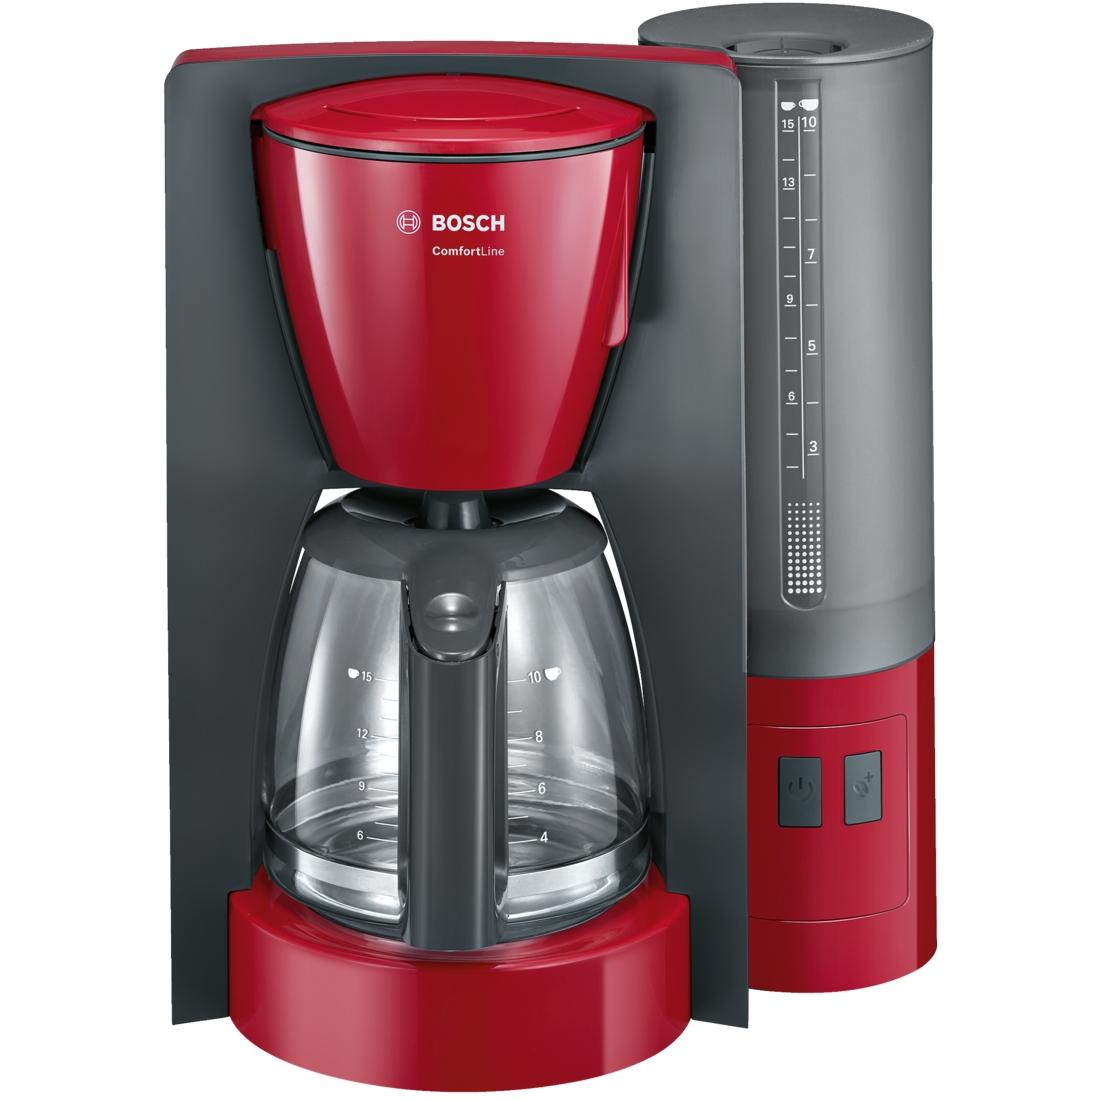 Cafetiera Bosch TKA6A044 ComfortLine 1.25 litri 1200W rosu - antracit